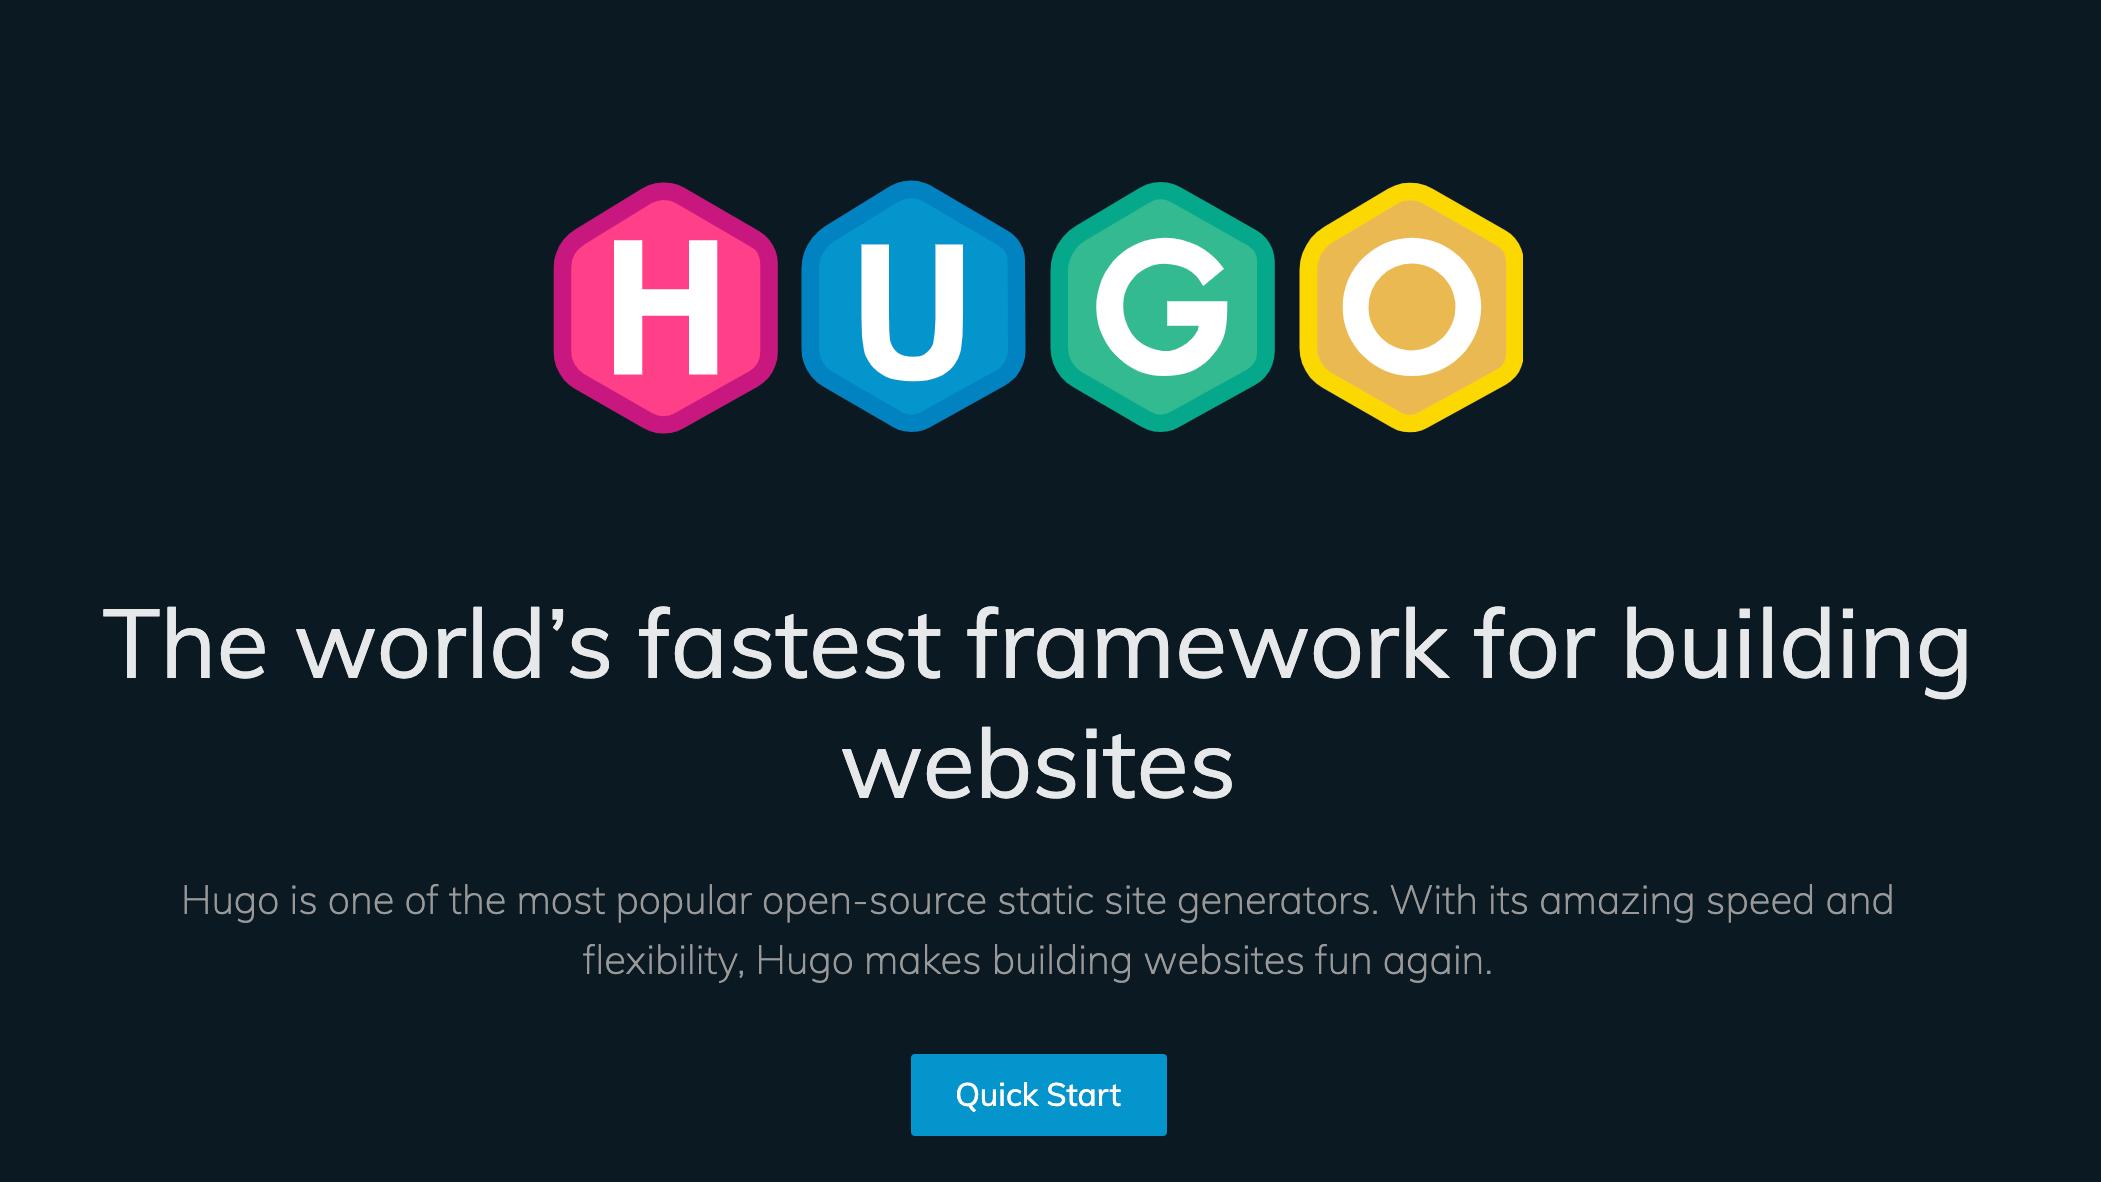 Image of the HUGO website